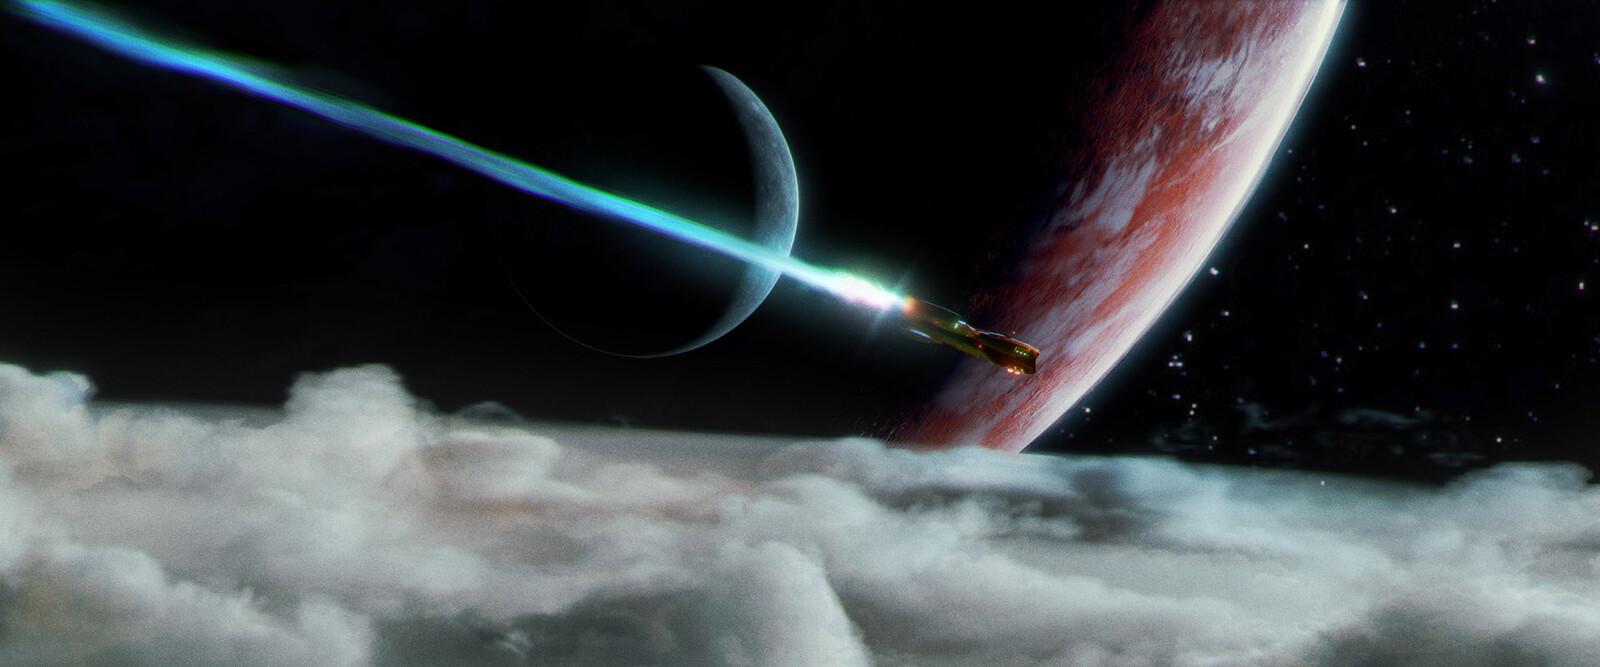 entering orbit